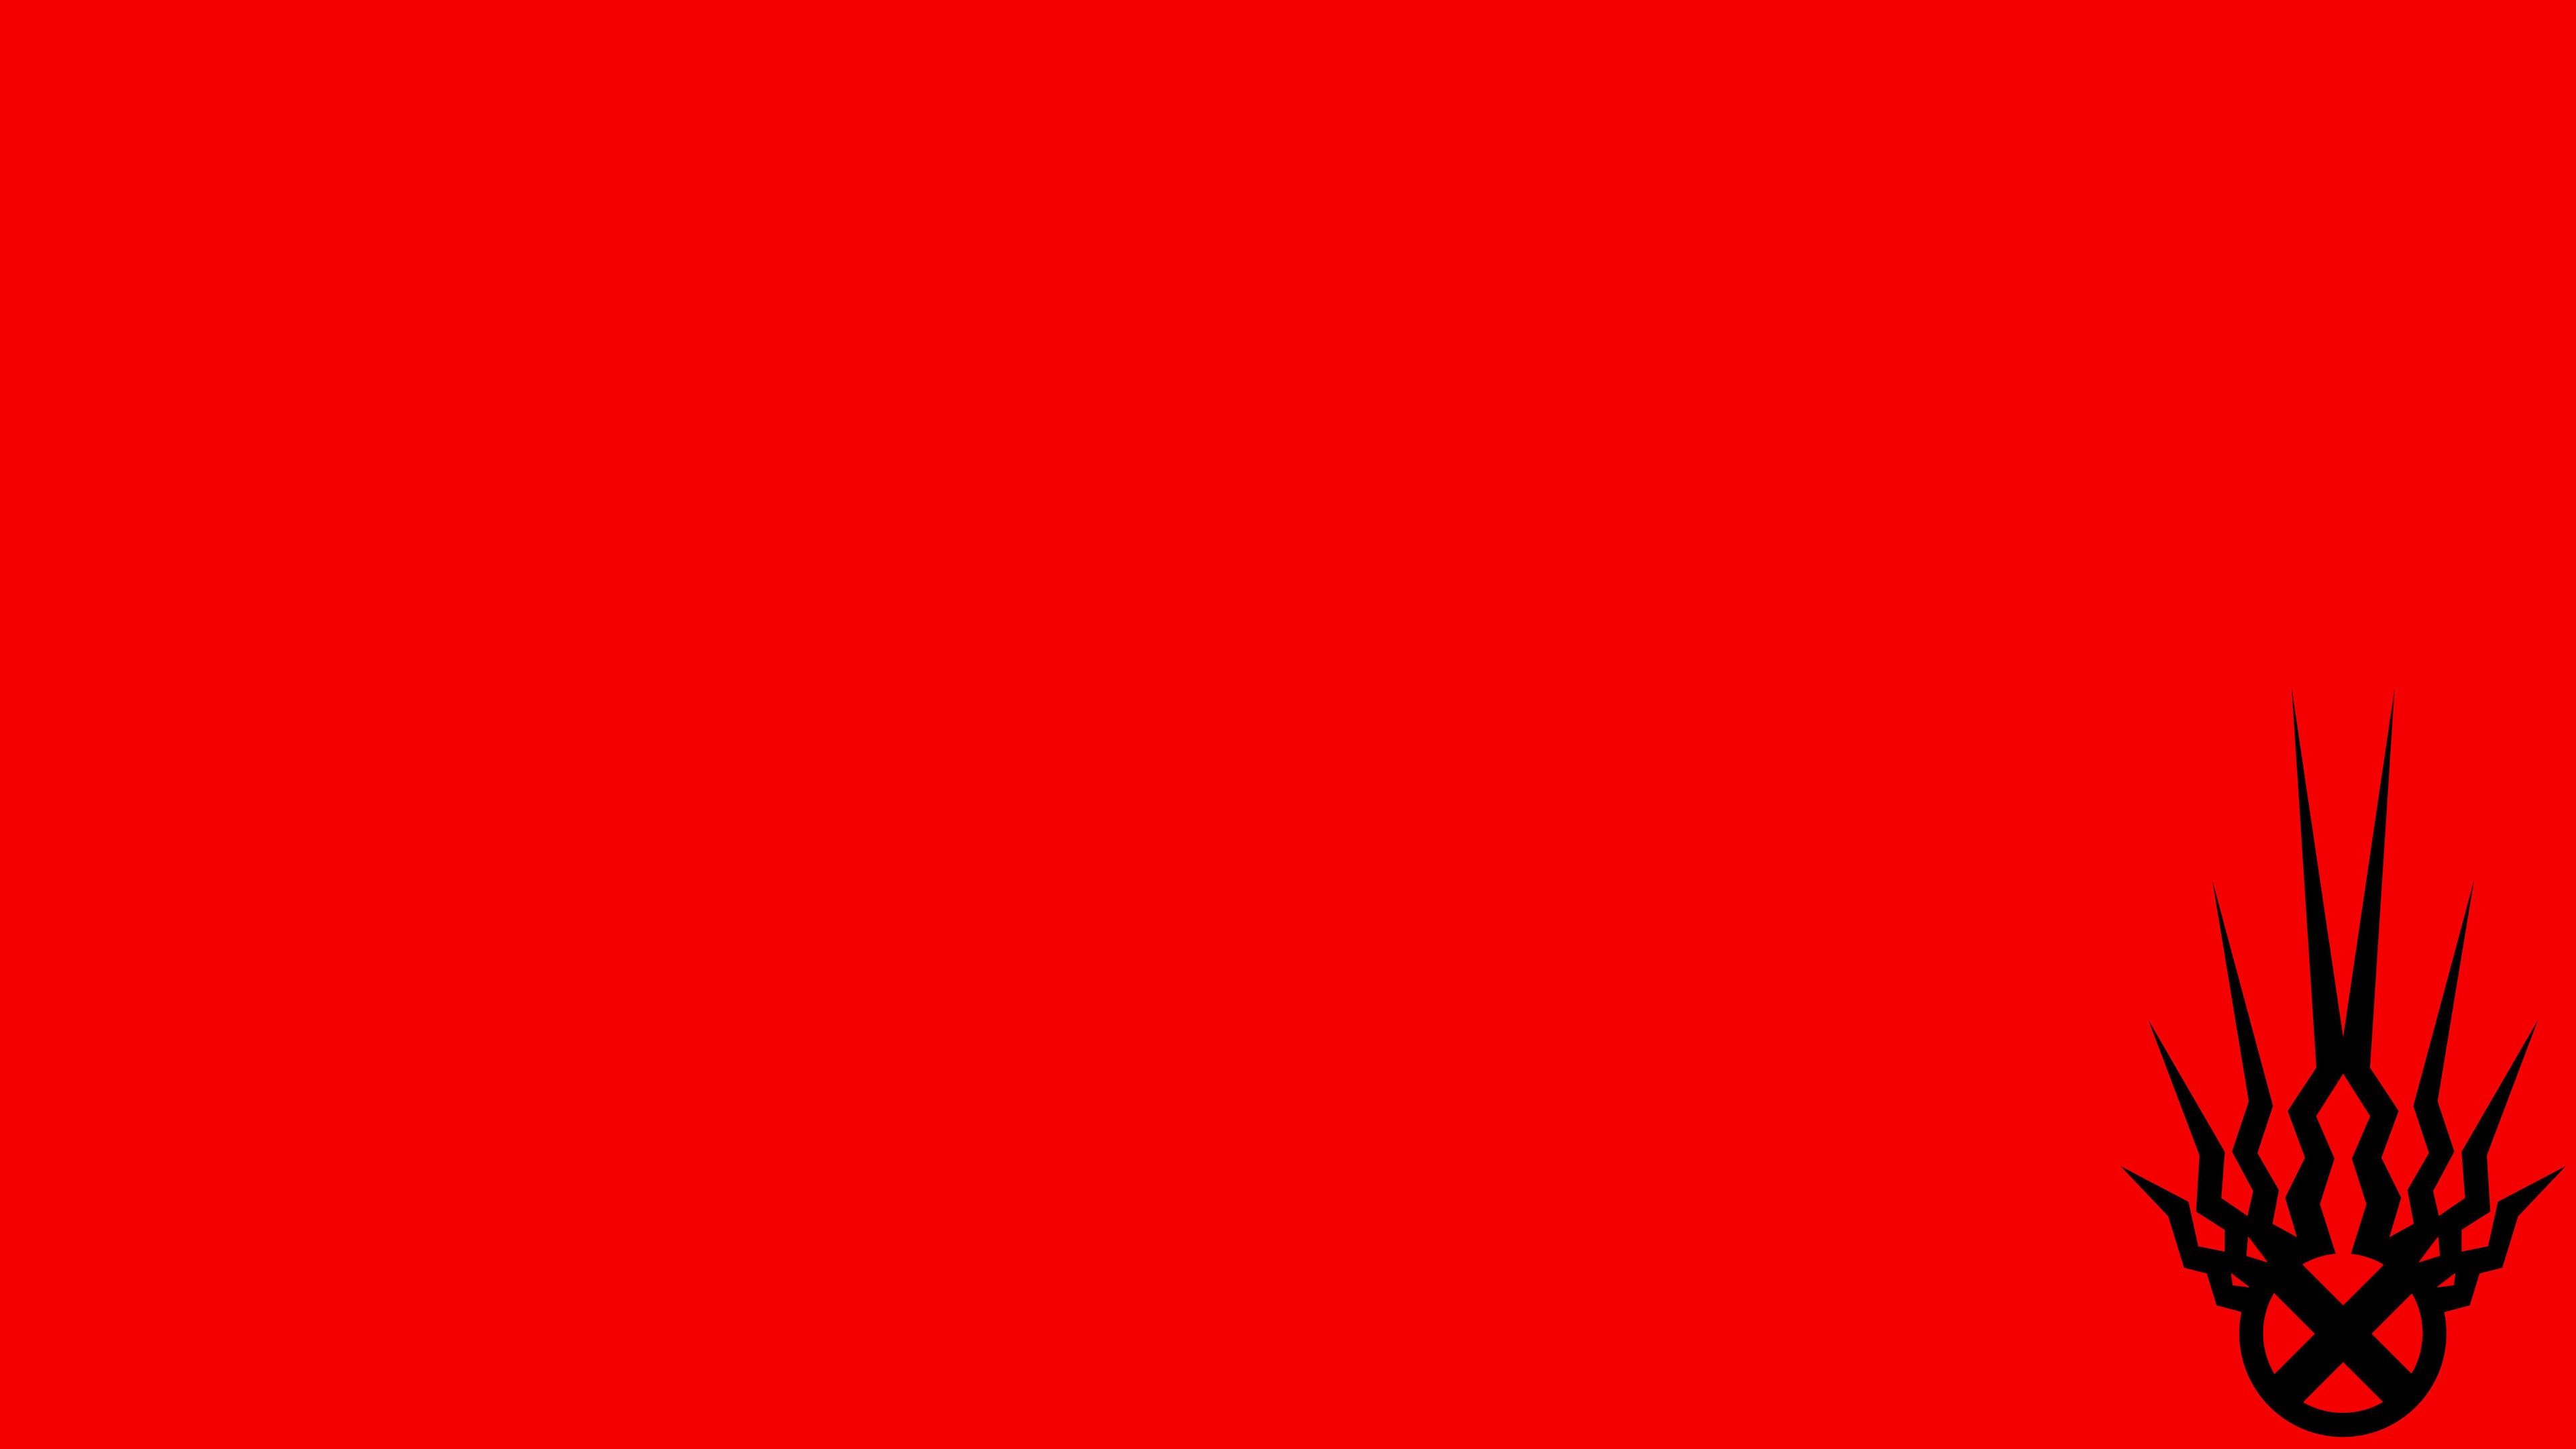 Fondo de pantalla rojo 4k HD